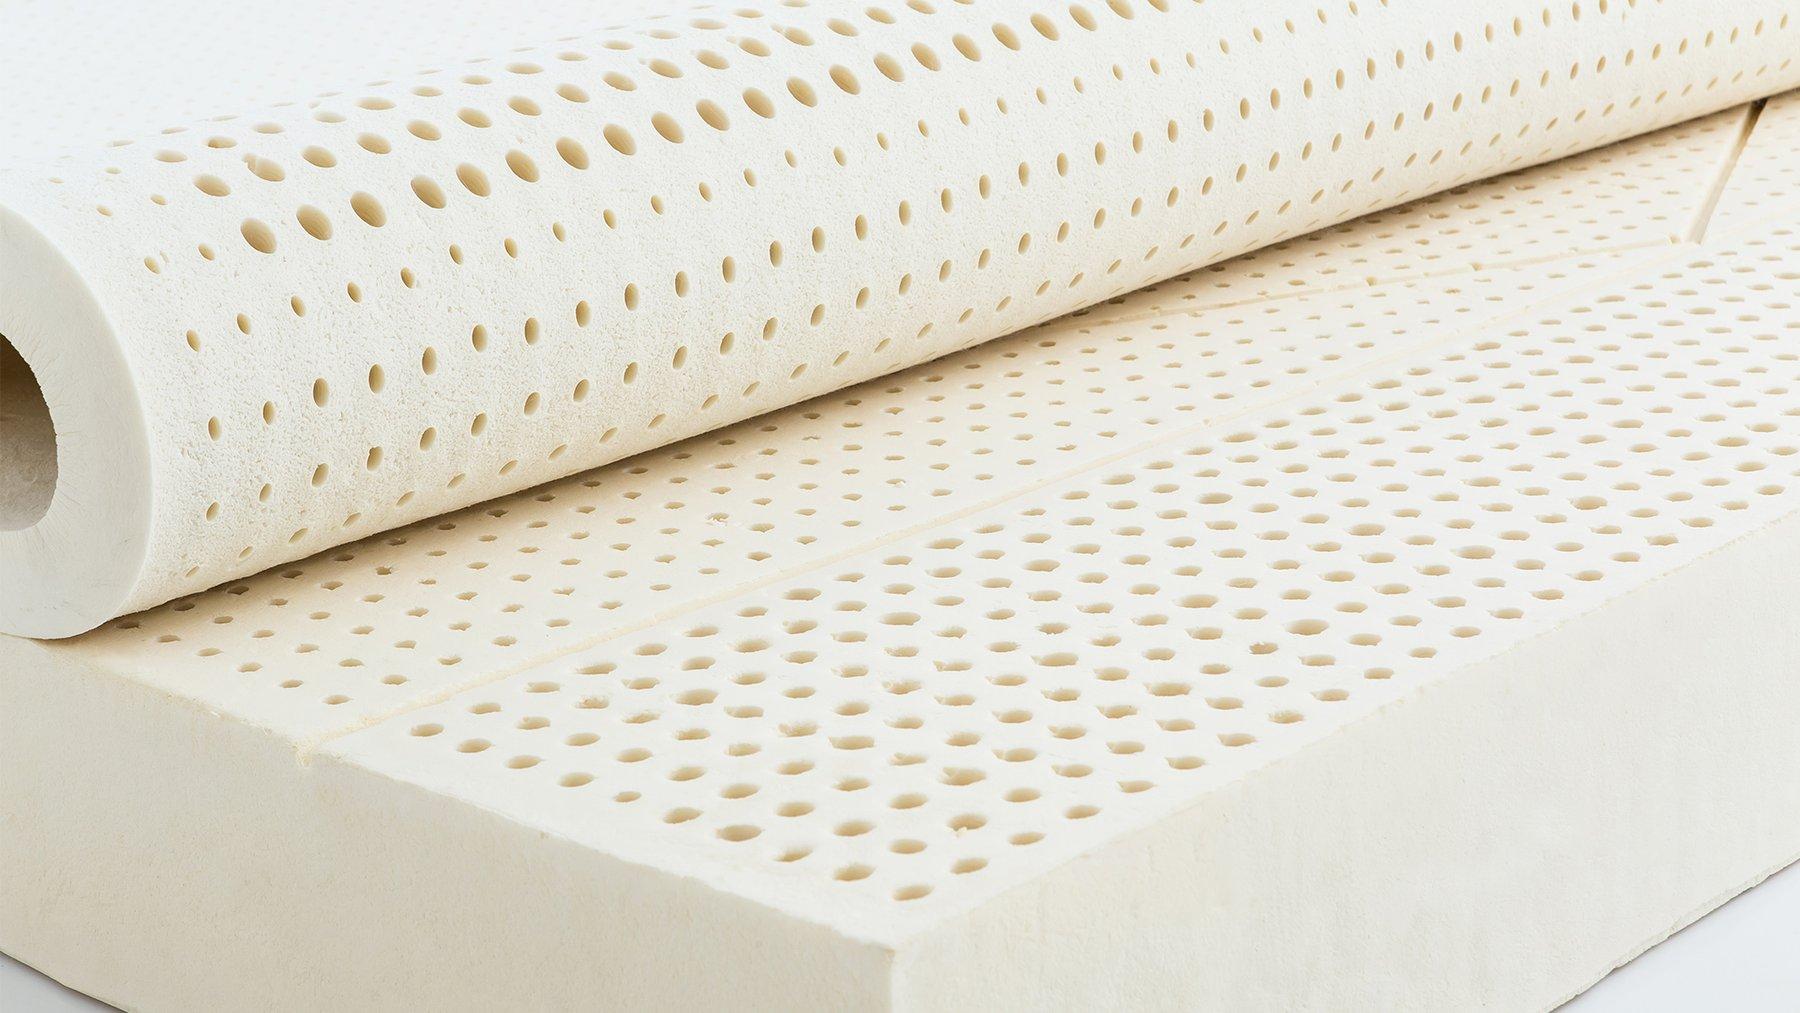 dunlop vs talalay latex mattress